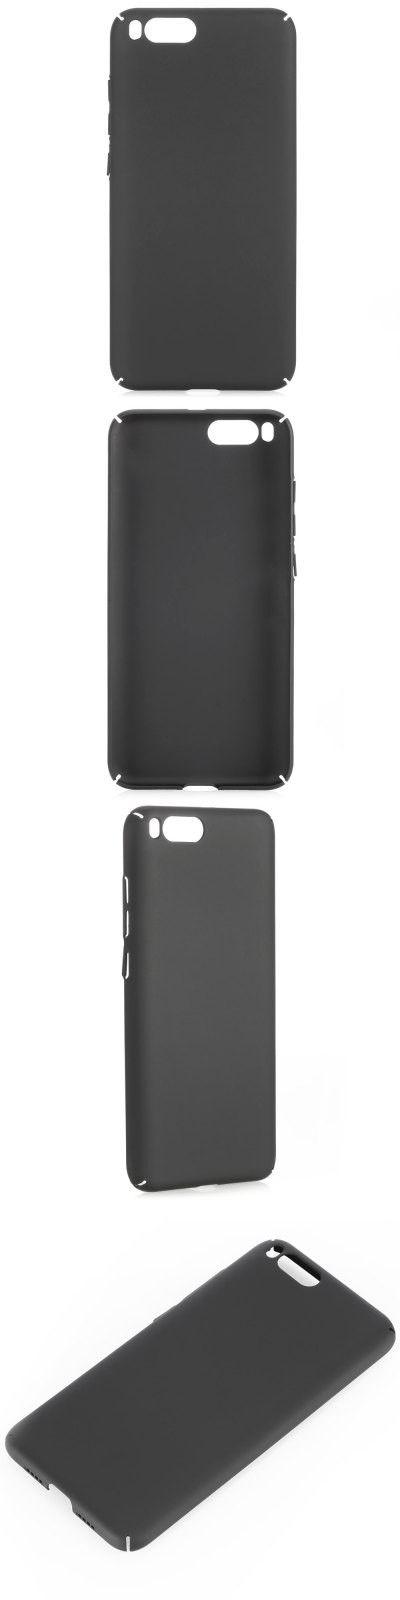 Luanke PC Case for Xiaomi Mi 6-3.57